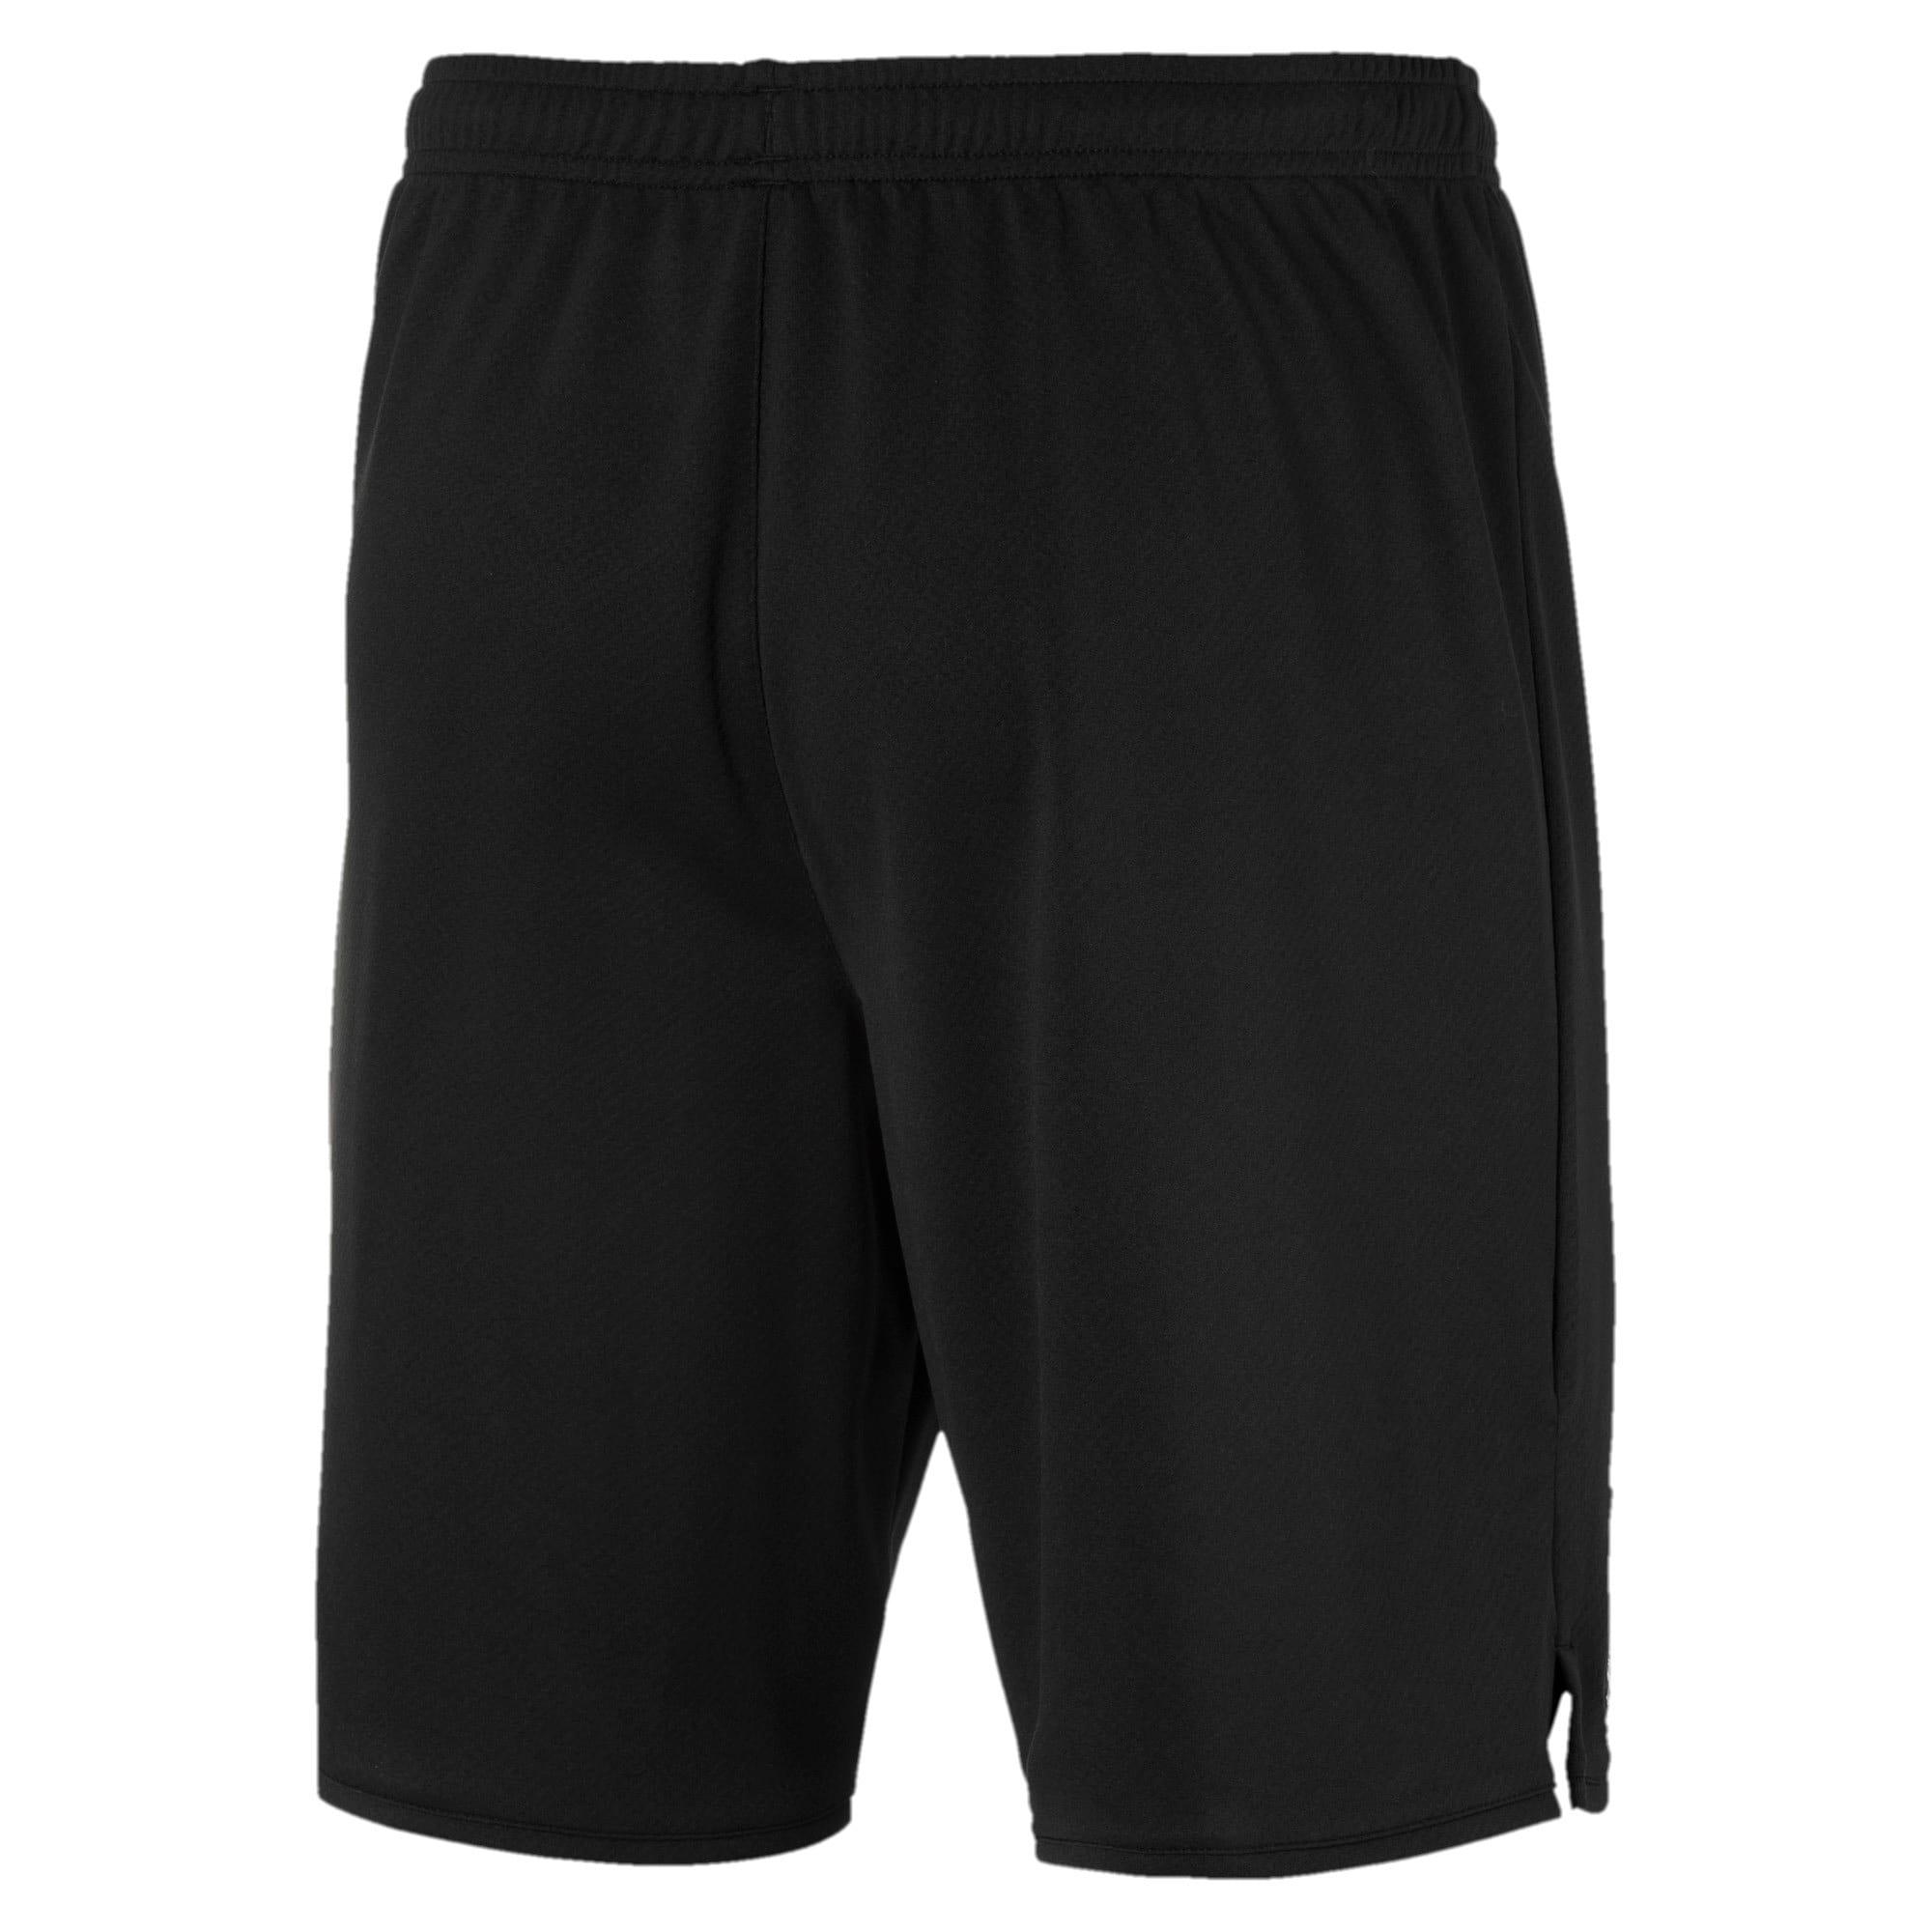 Thumbnail 2 of Newcastle United FC Men's Replica Shorts, Puma Black, medium